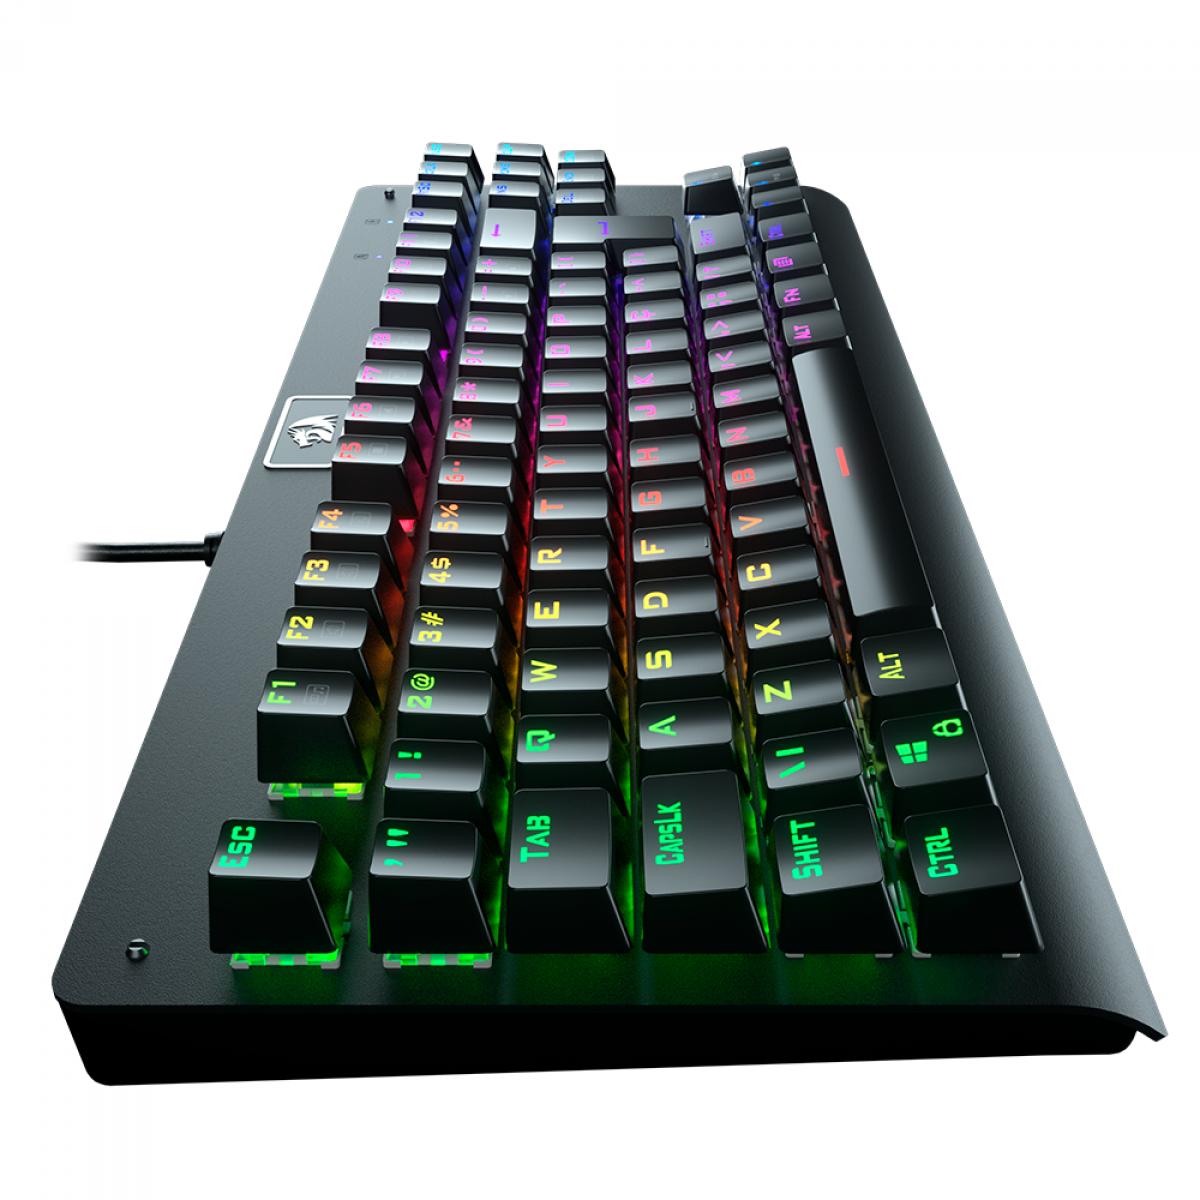 Teclado Mecânico Gamer Redragon Dark Avenger K568 RGB, Switch Outemu Blue, ABNT2, Black, K568RGB-1